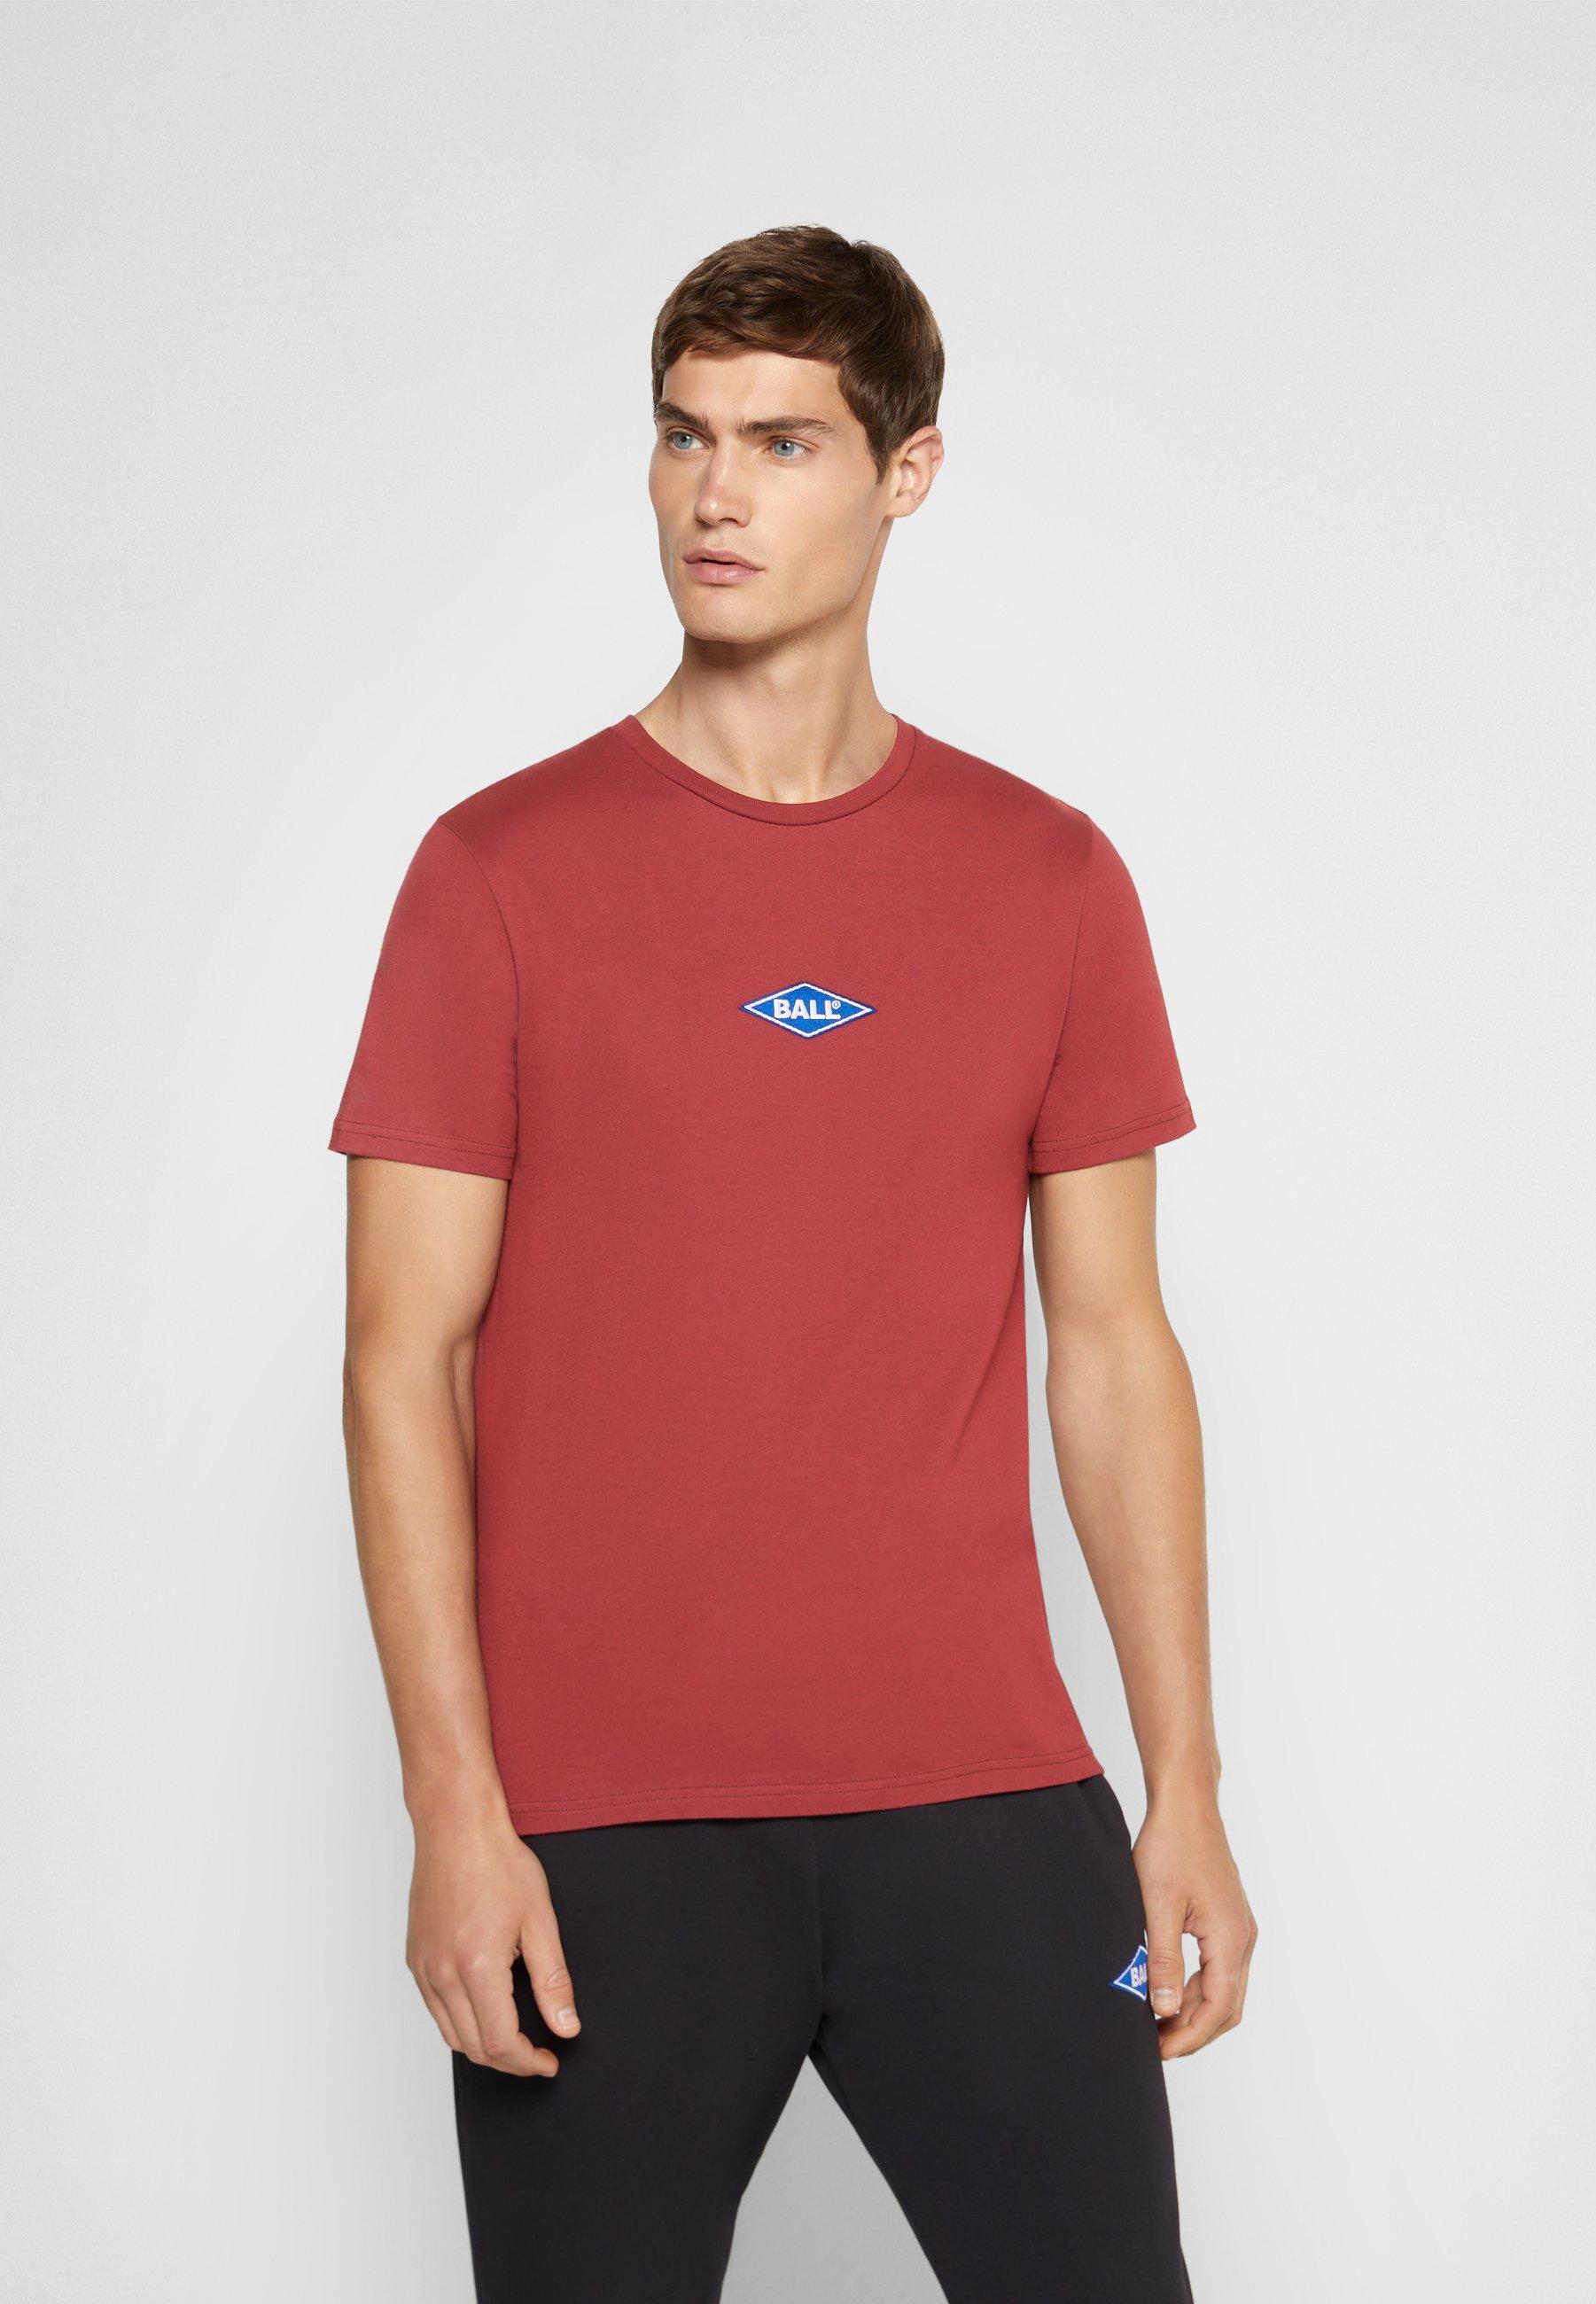 Homme BALL RIMINI NASH  - T-shirt basique